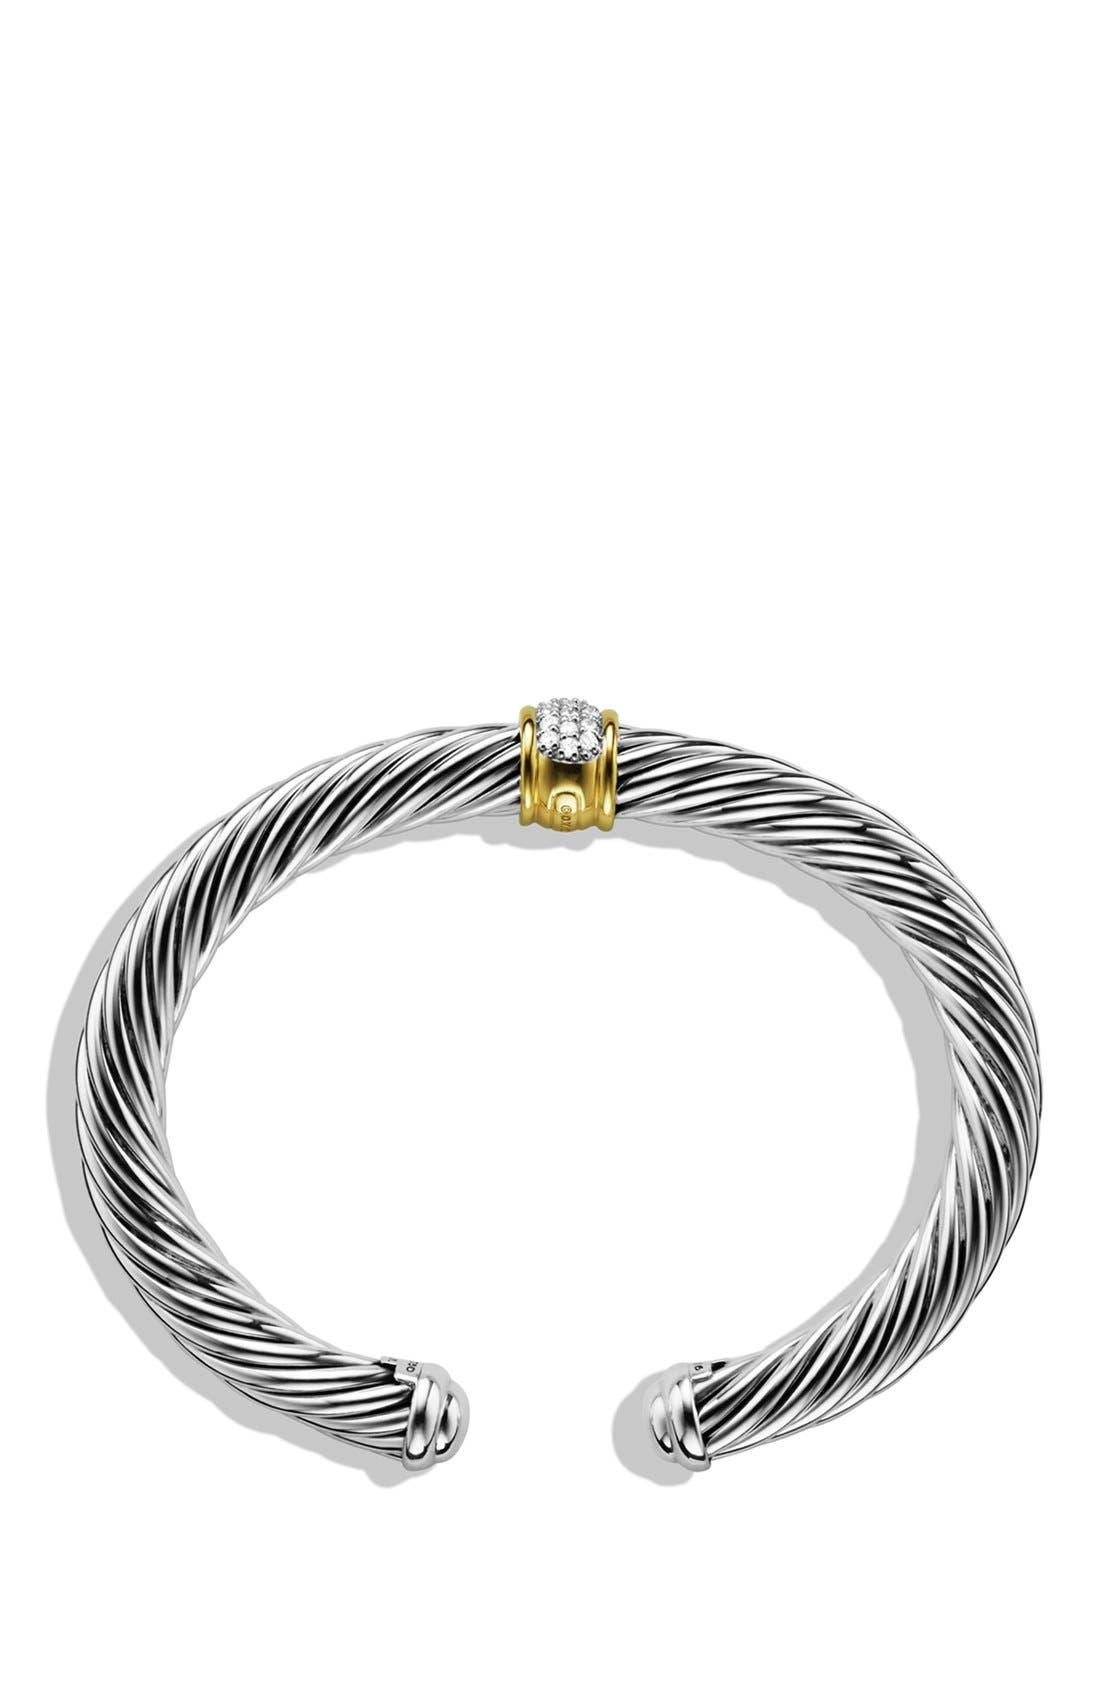 Cable Classics Bracelet with Diamonds & 18K Gold, 7mm,                             Alternate thumbnail 2, color,                             Diamond